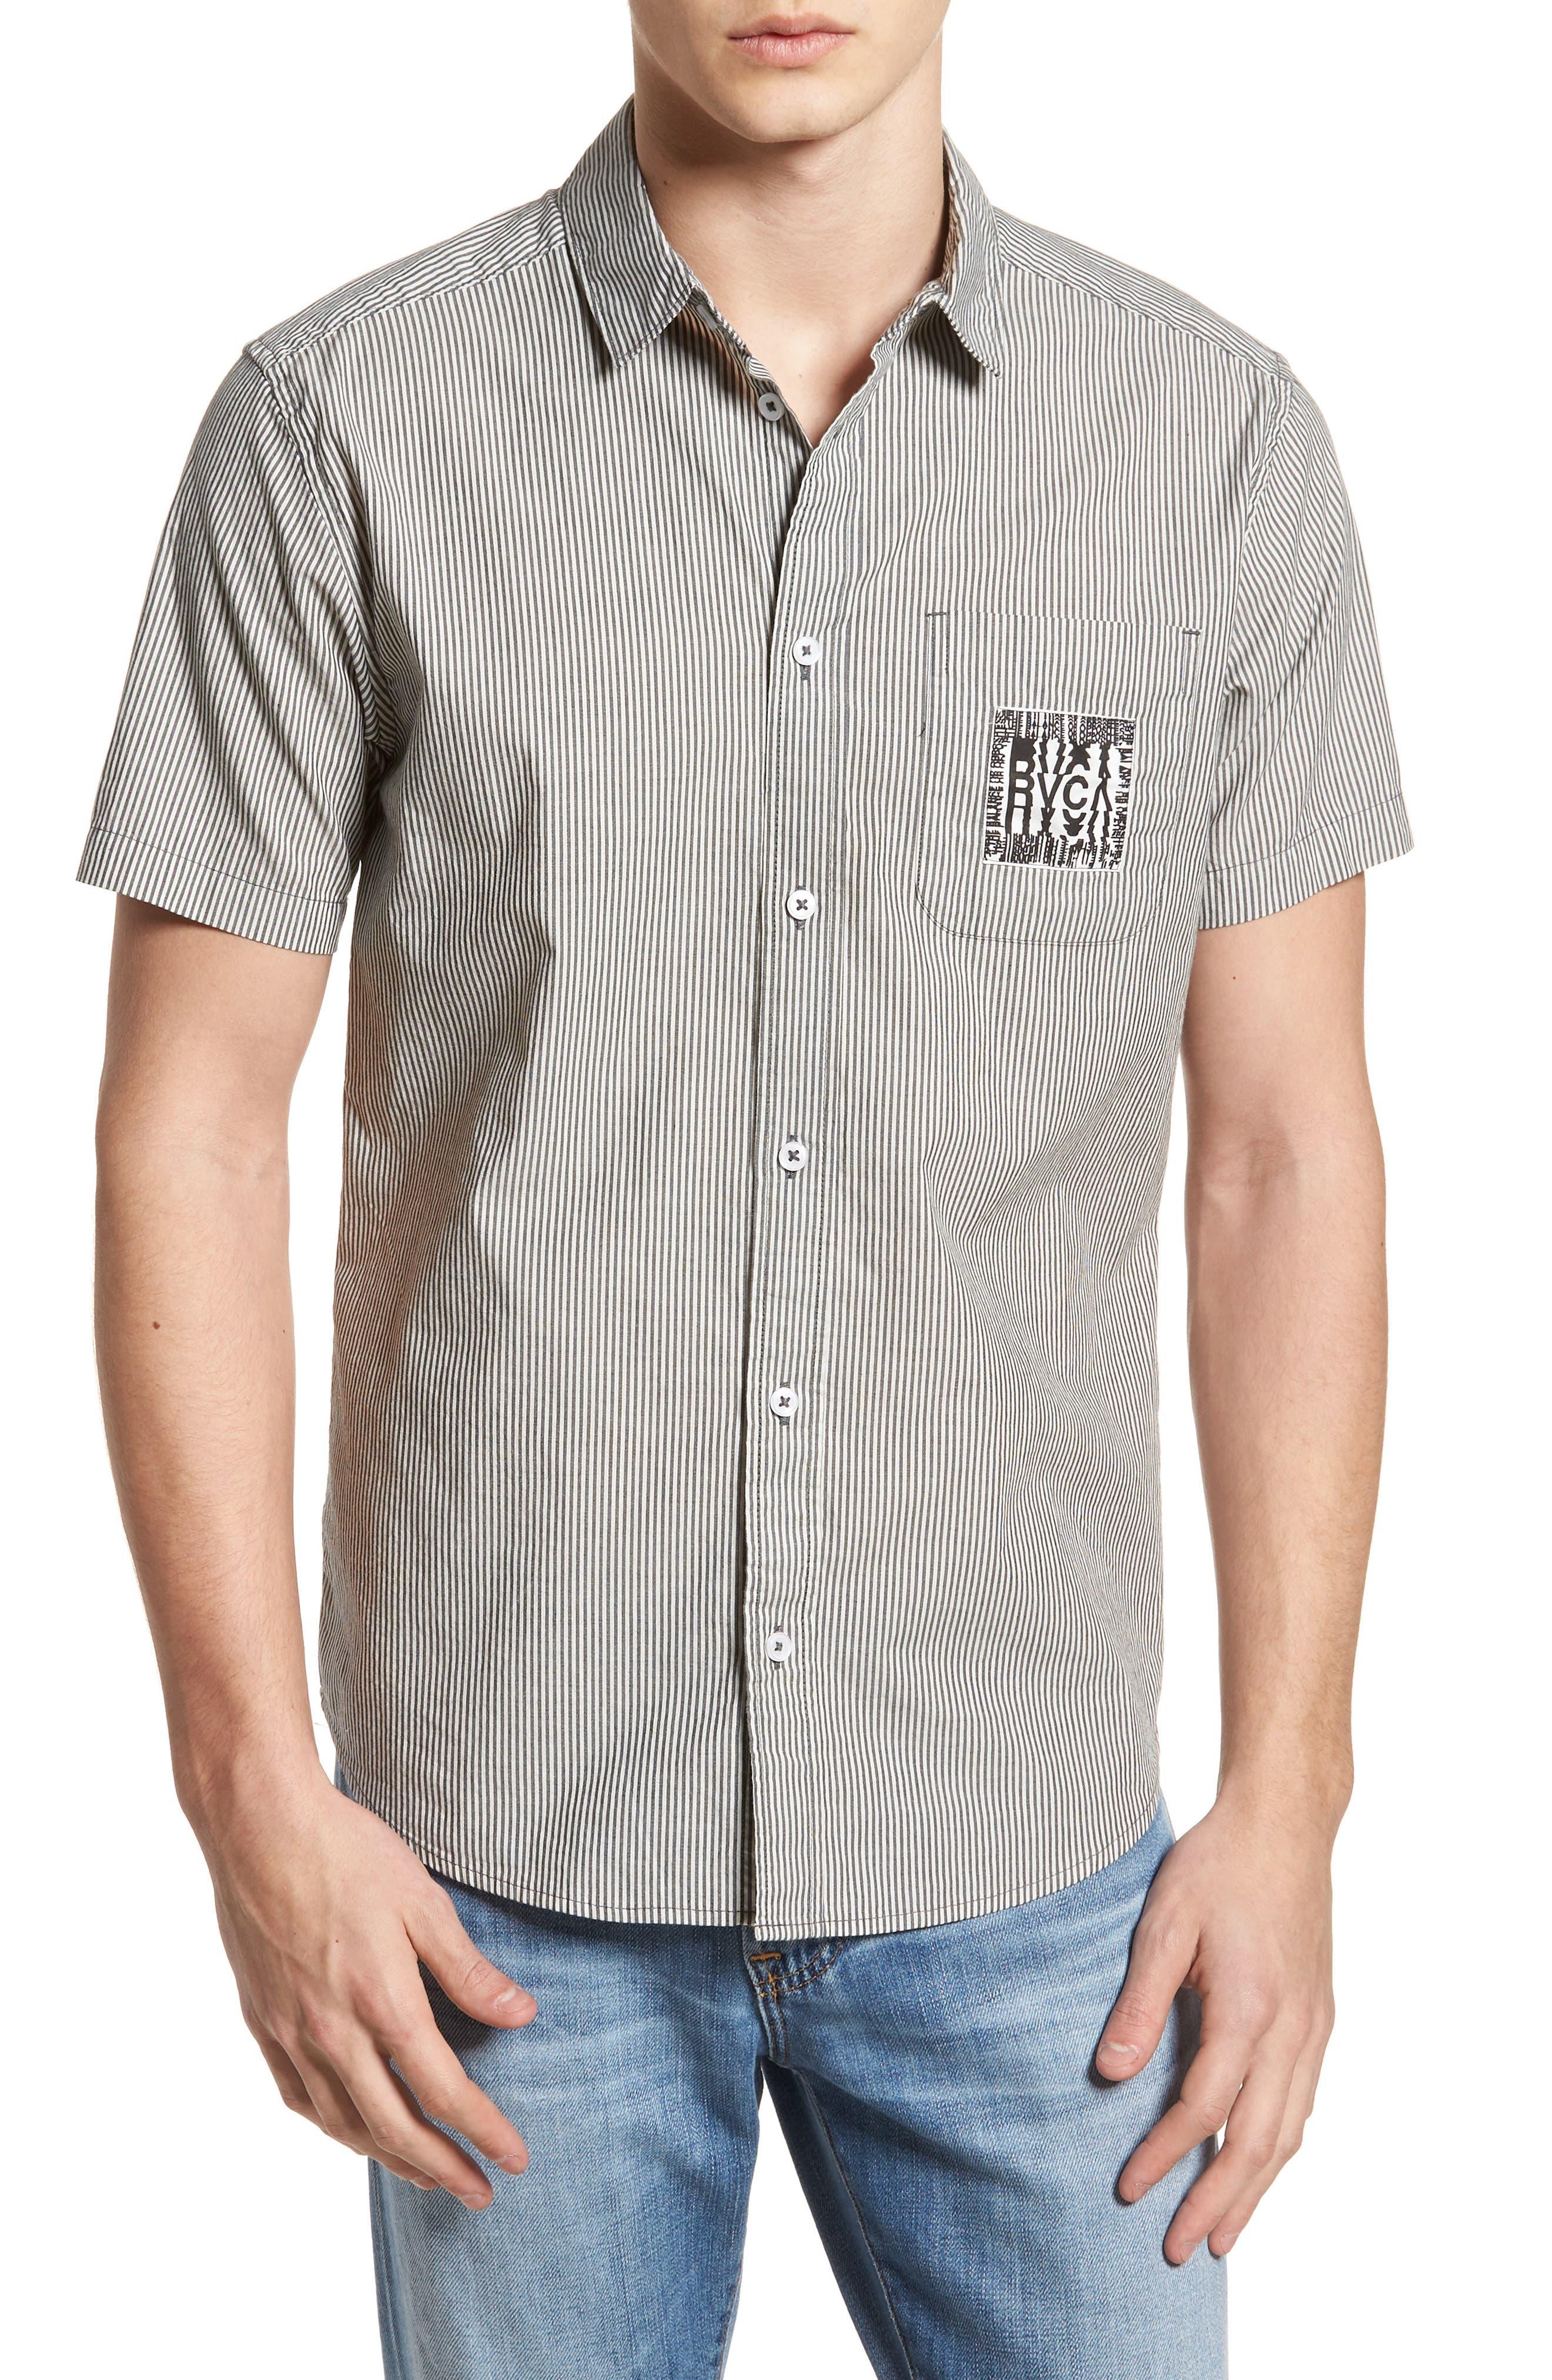 Alternate Image 1 Selected - RVCA resort Disruption Woven Shirt